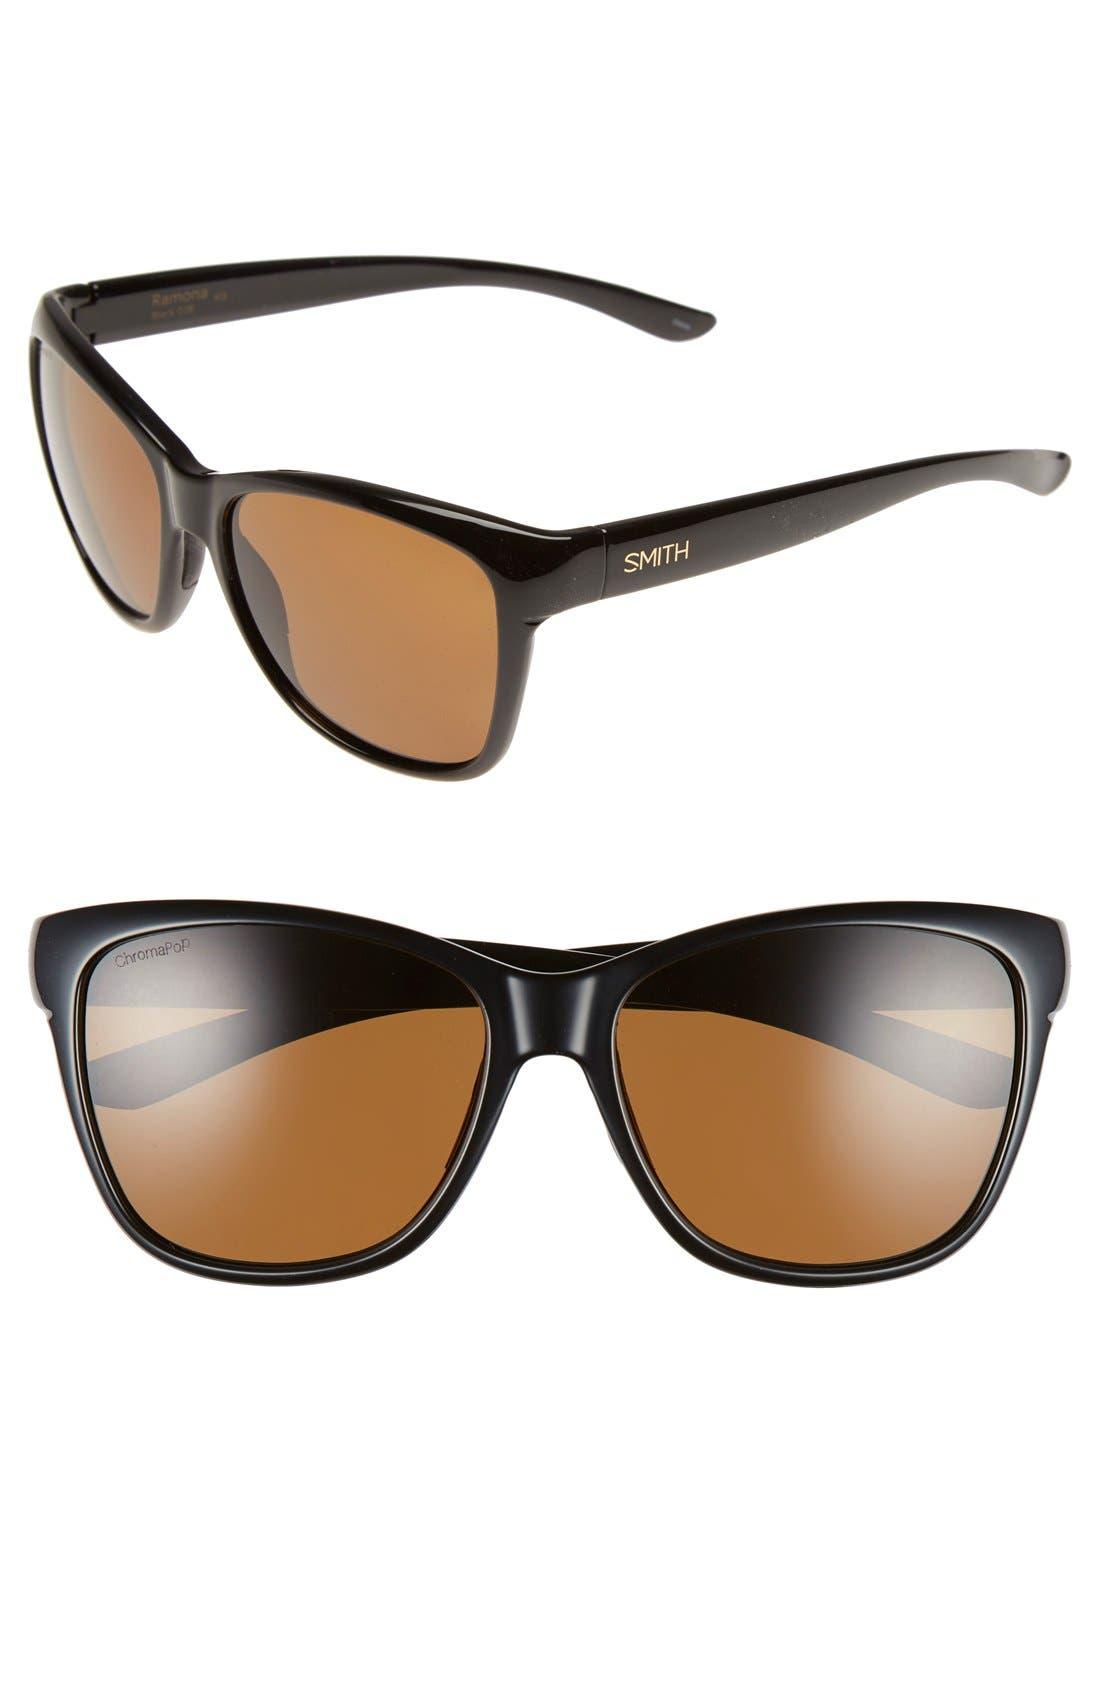 Smith 'Ramona' 56mm ChromaPop Polarized Sunglasses